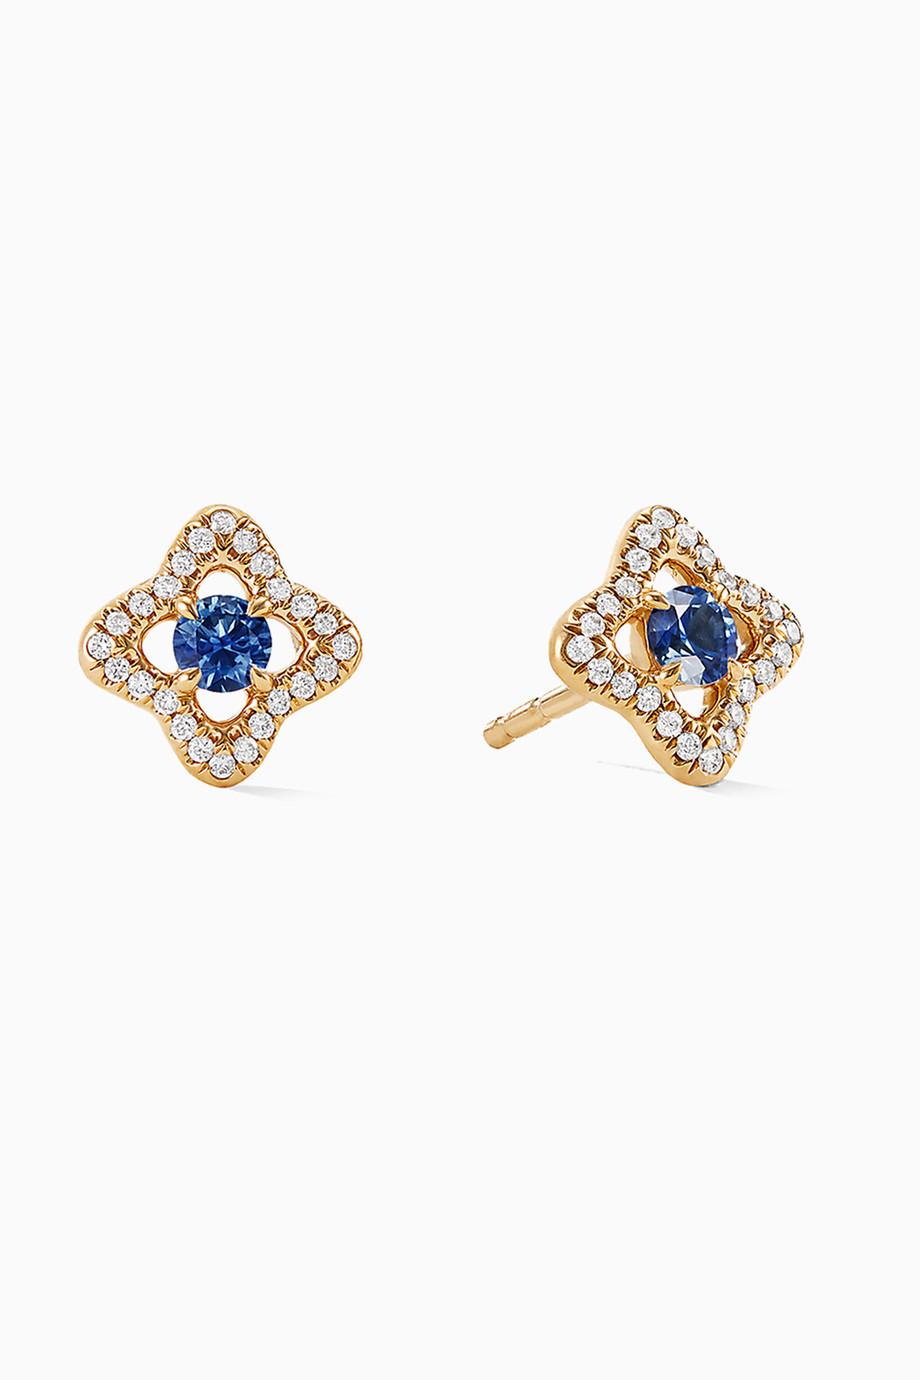 455c6b4ea74c62 Shop David Yurman Yellow Venetian Quatrefoil® Blue Sapphires ...